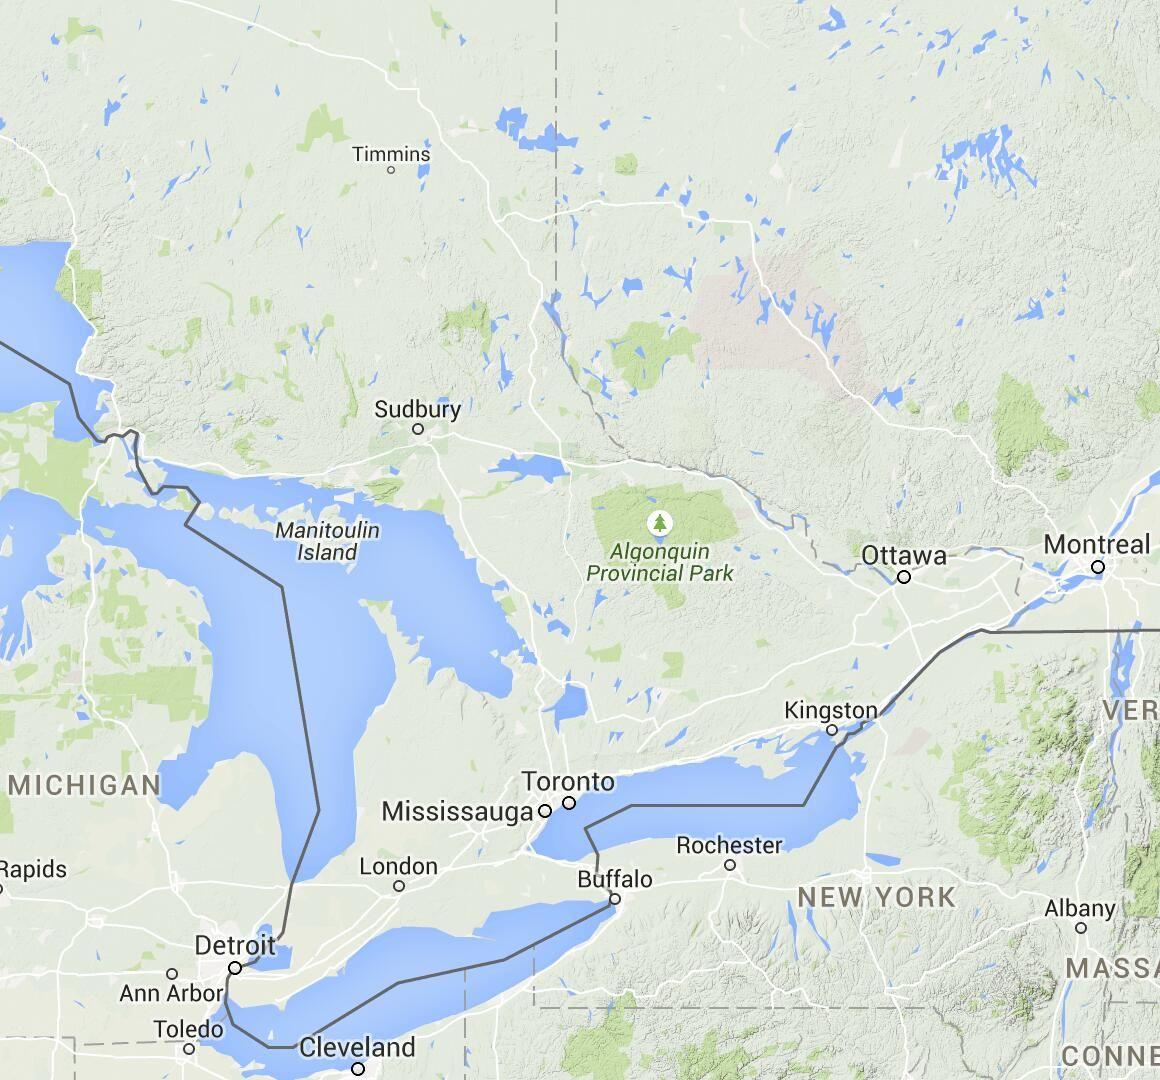 6a43cfe1024e20a762b337617ab38ec5 - What Zone Is Ottawa In For Gardening